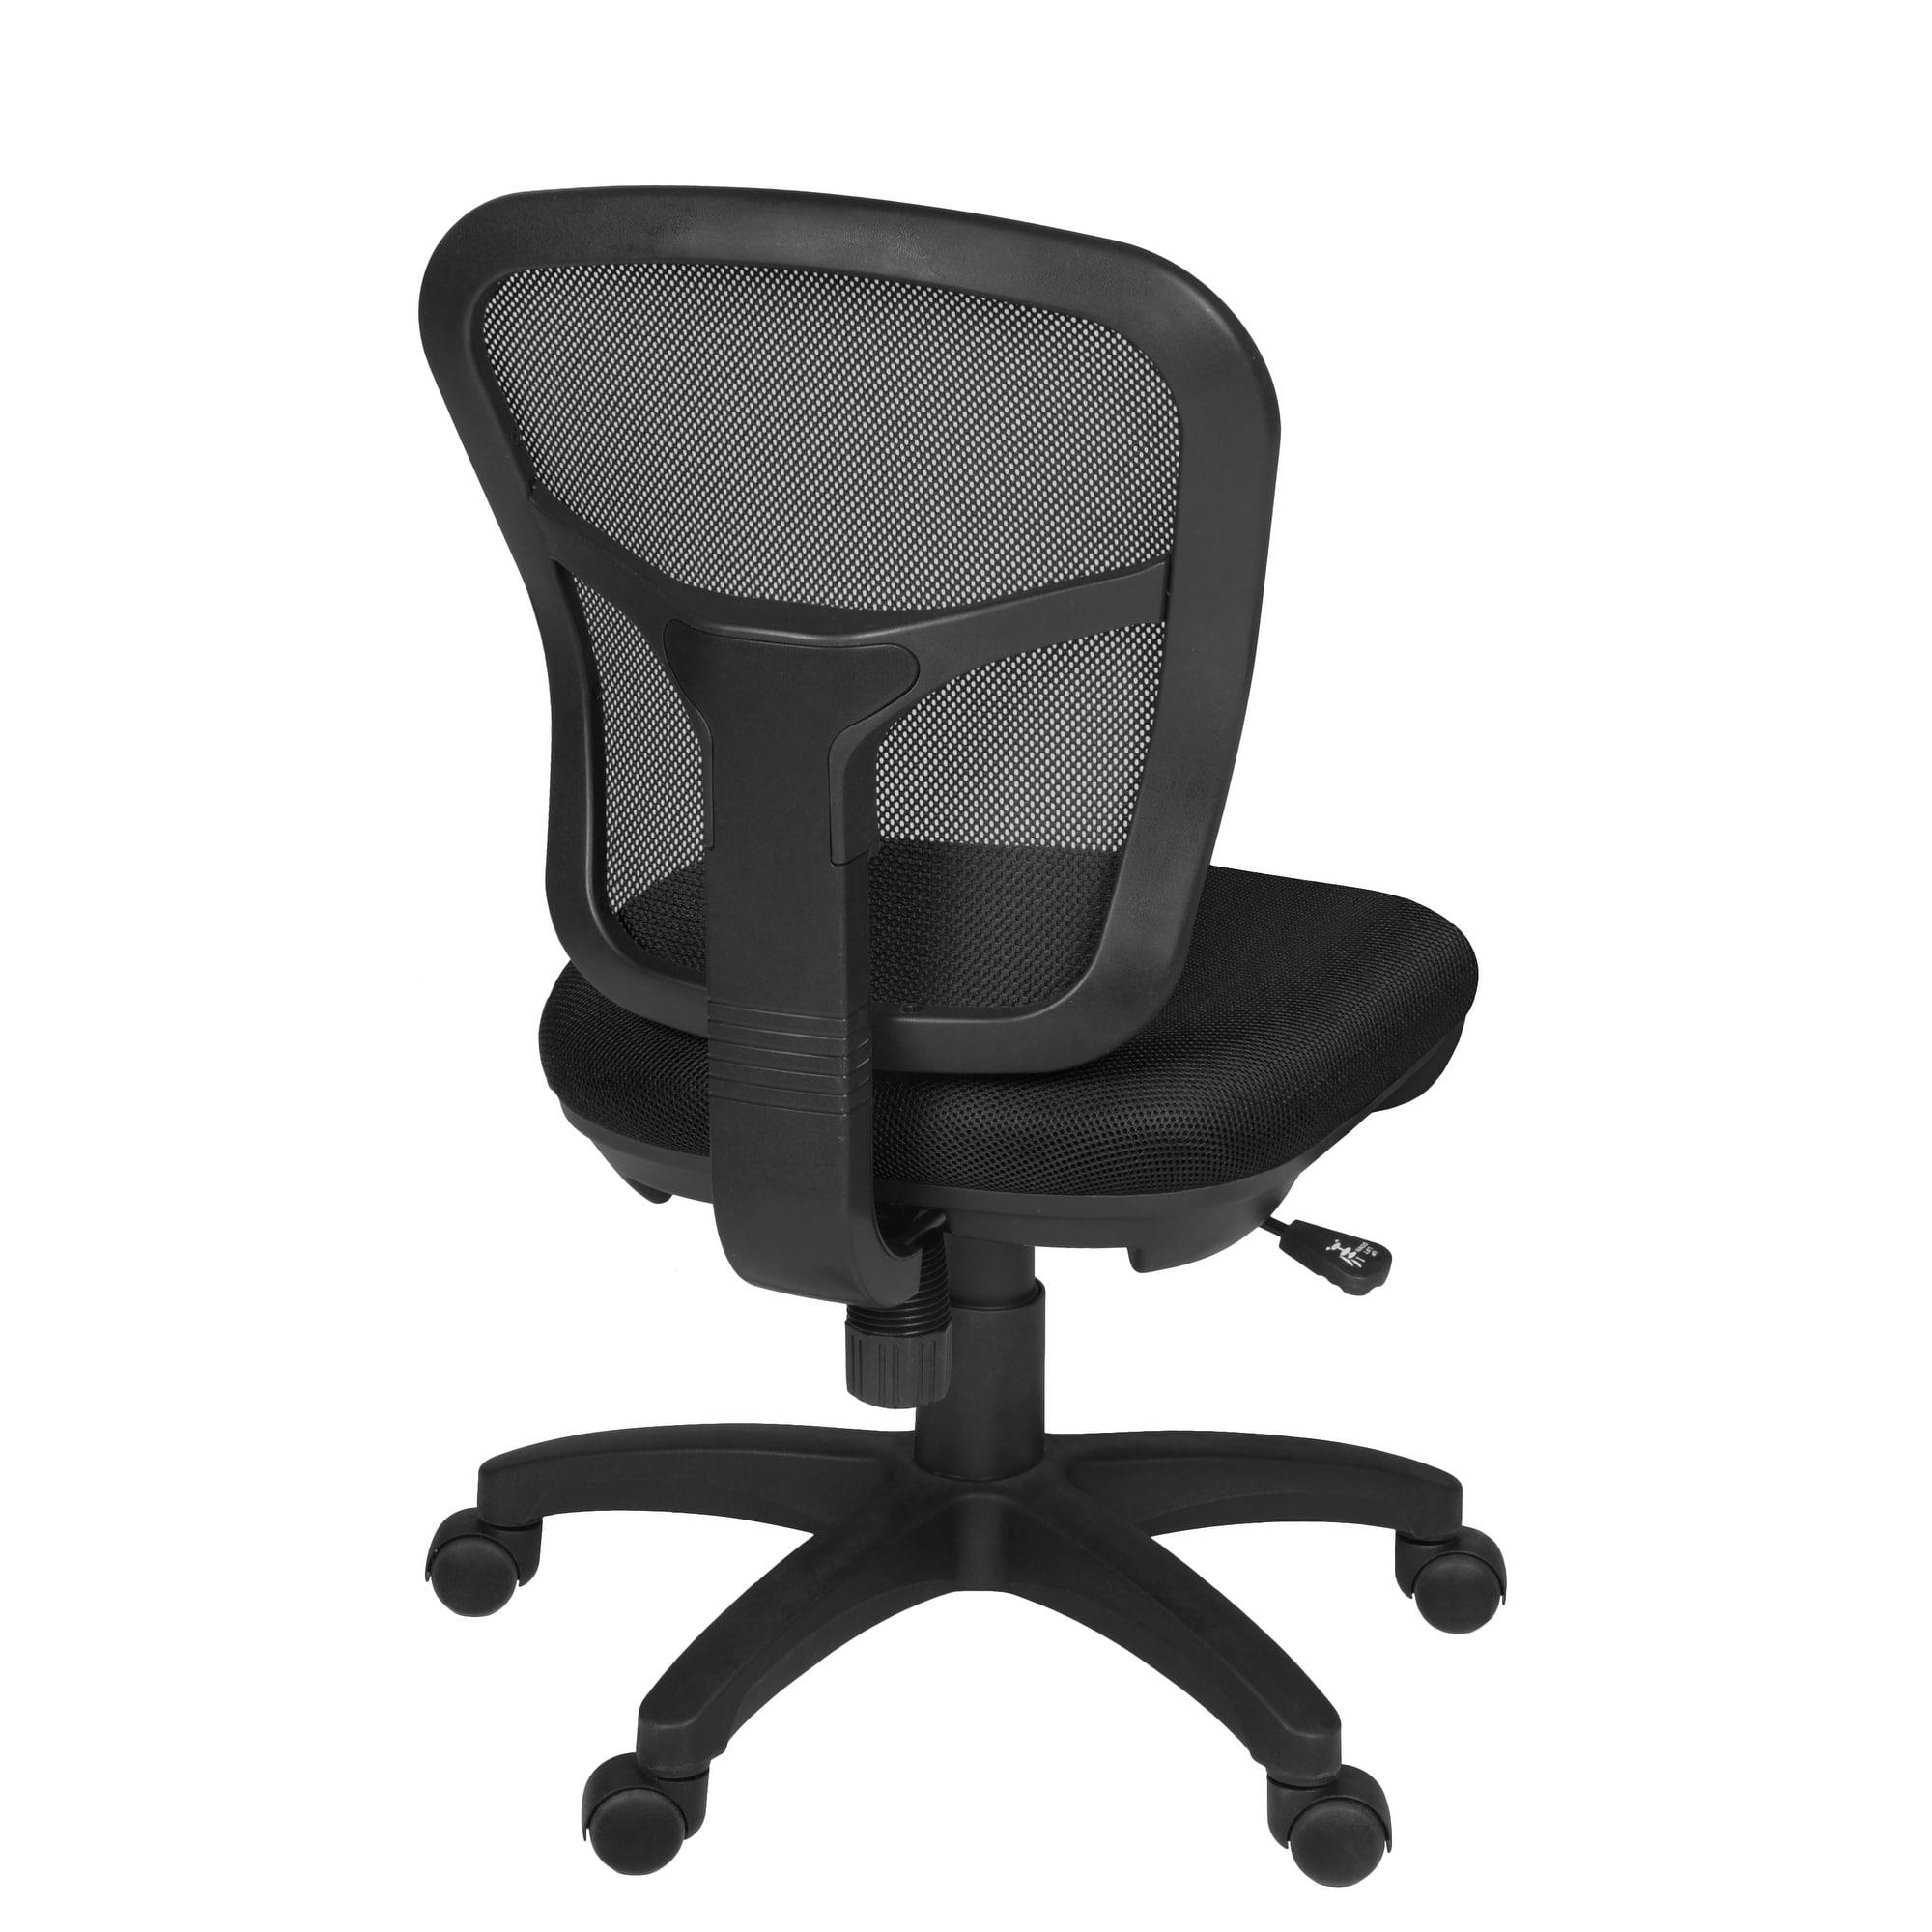 Harrington Armless Swivel Chair Black On Sale Overstock 31859183